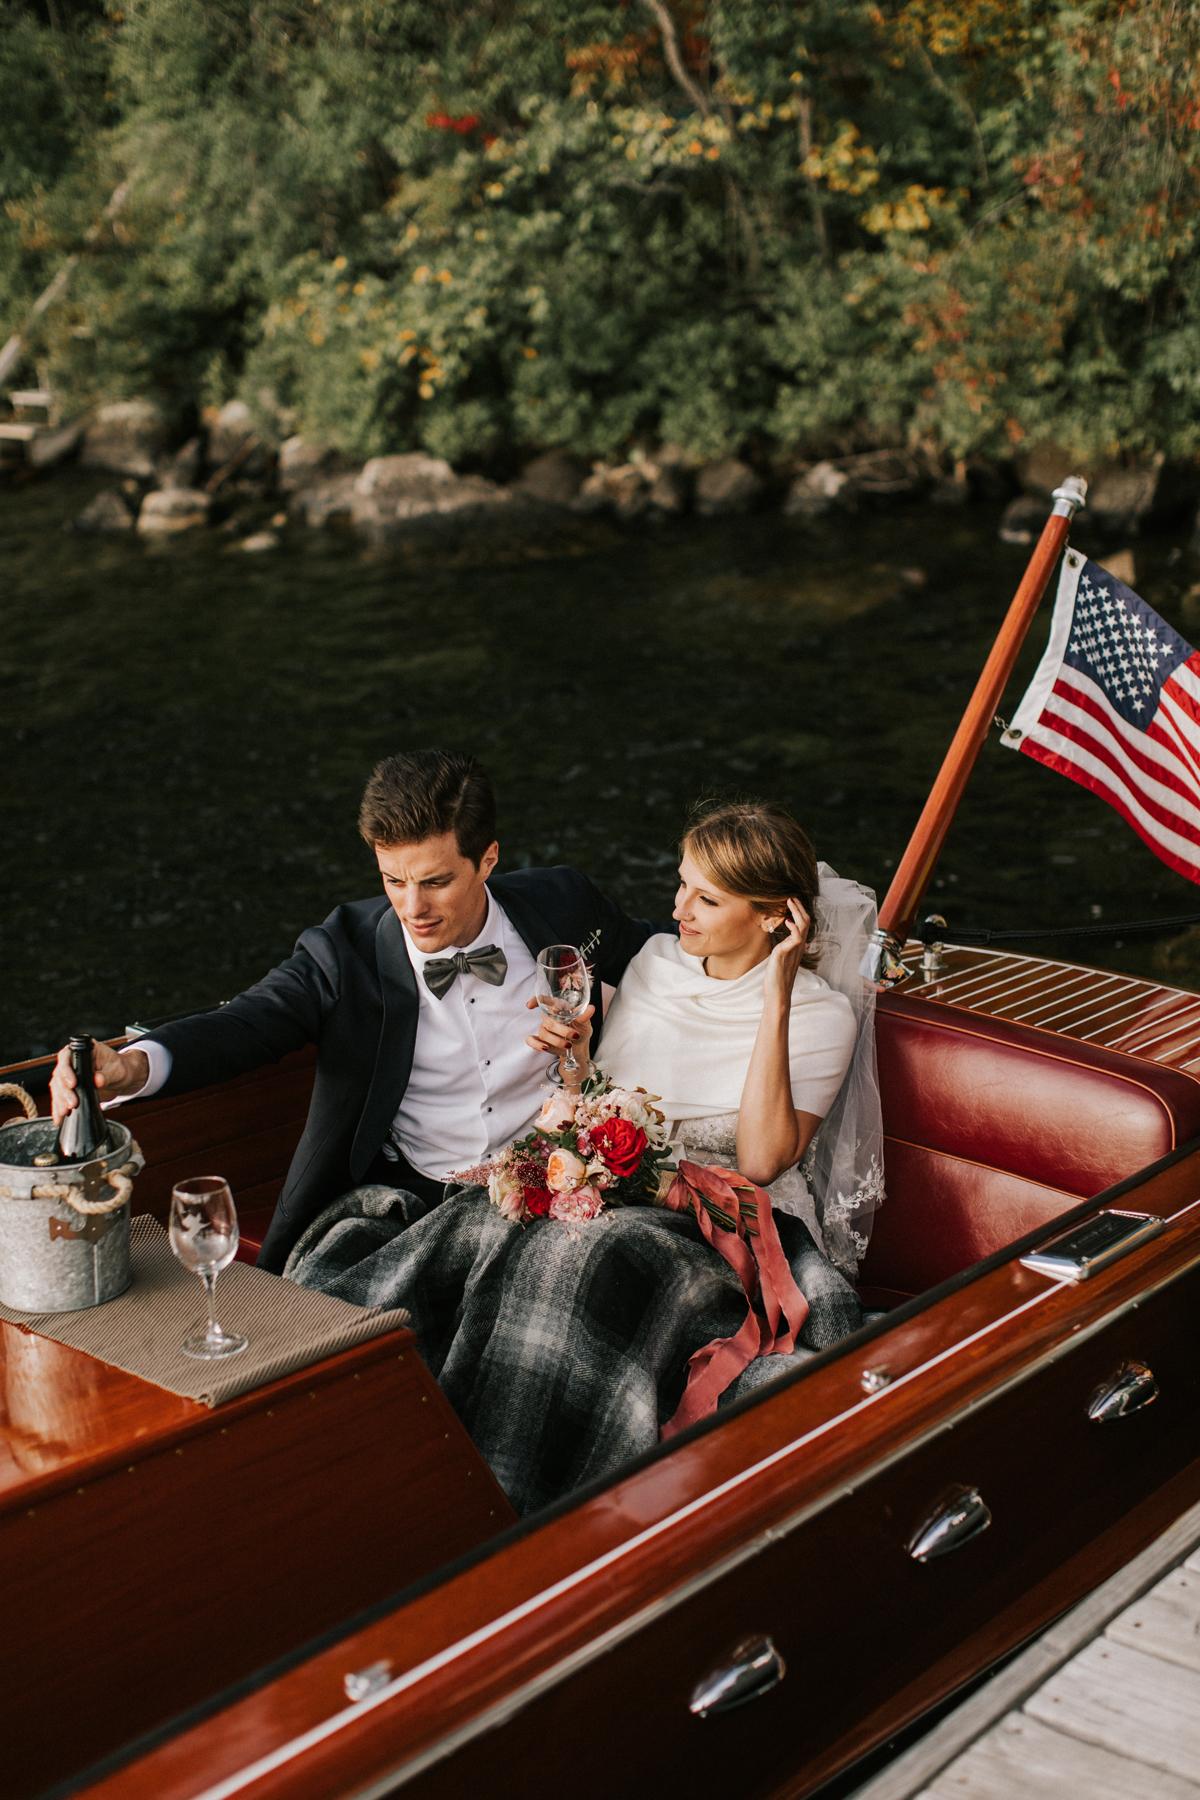 bride and groom sitting in vintage wooden Chris Craft boat